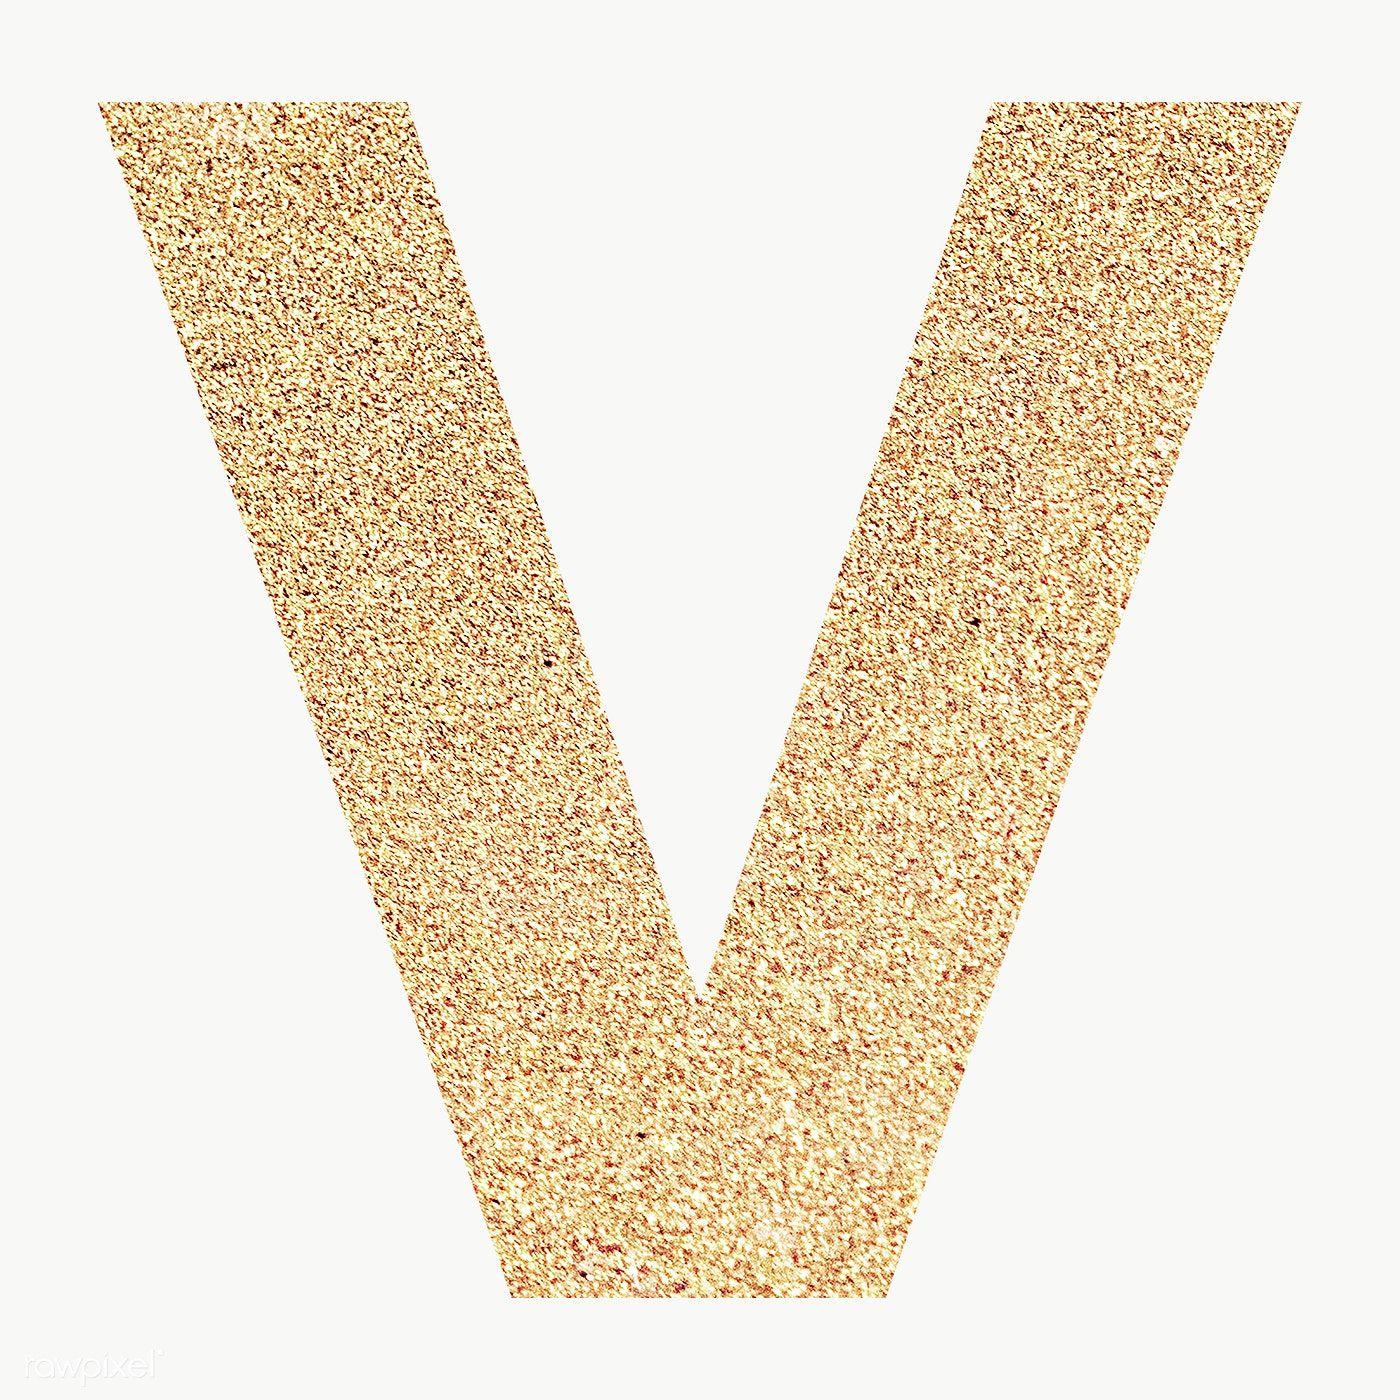 Glitter capital letter V sticker transparent png free